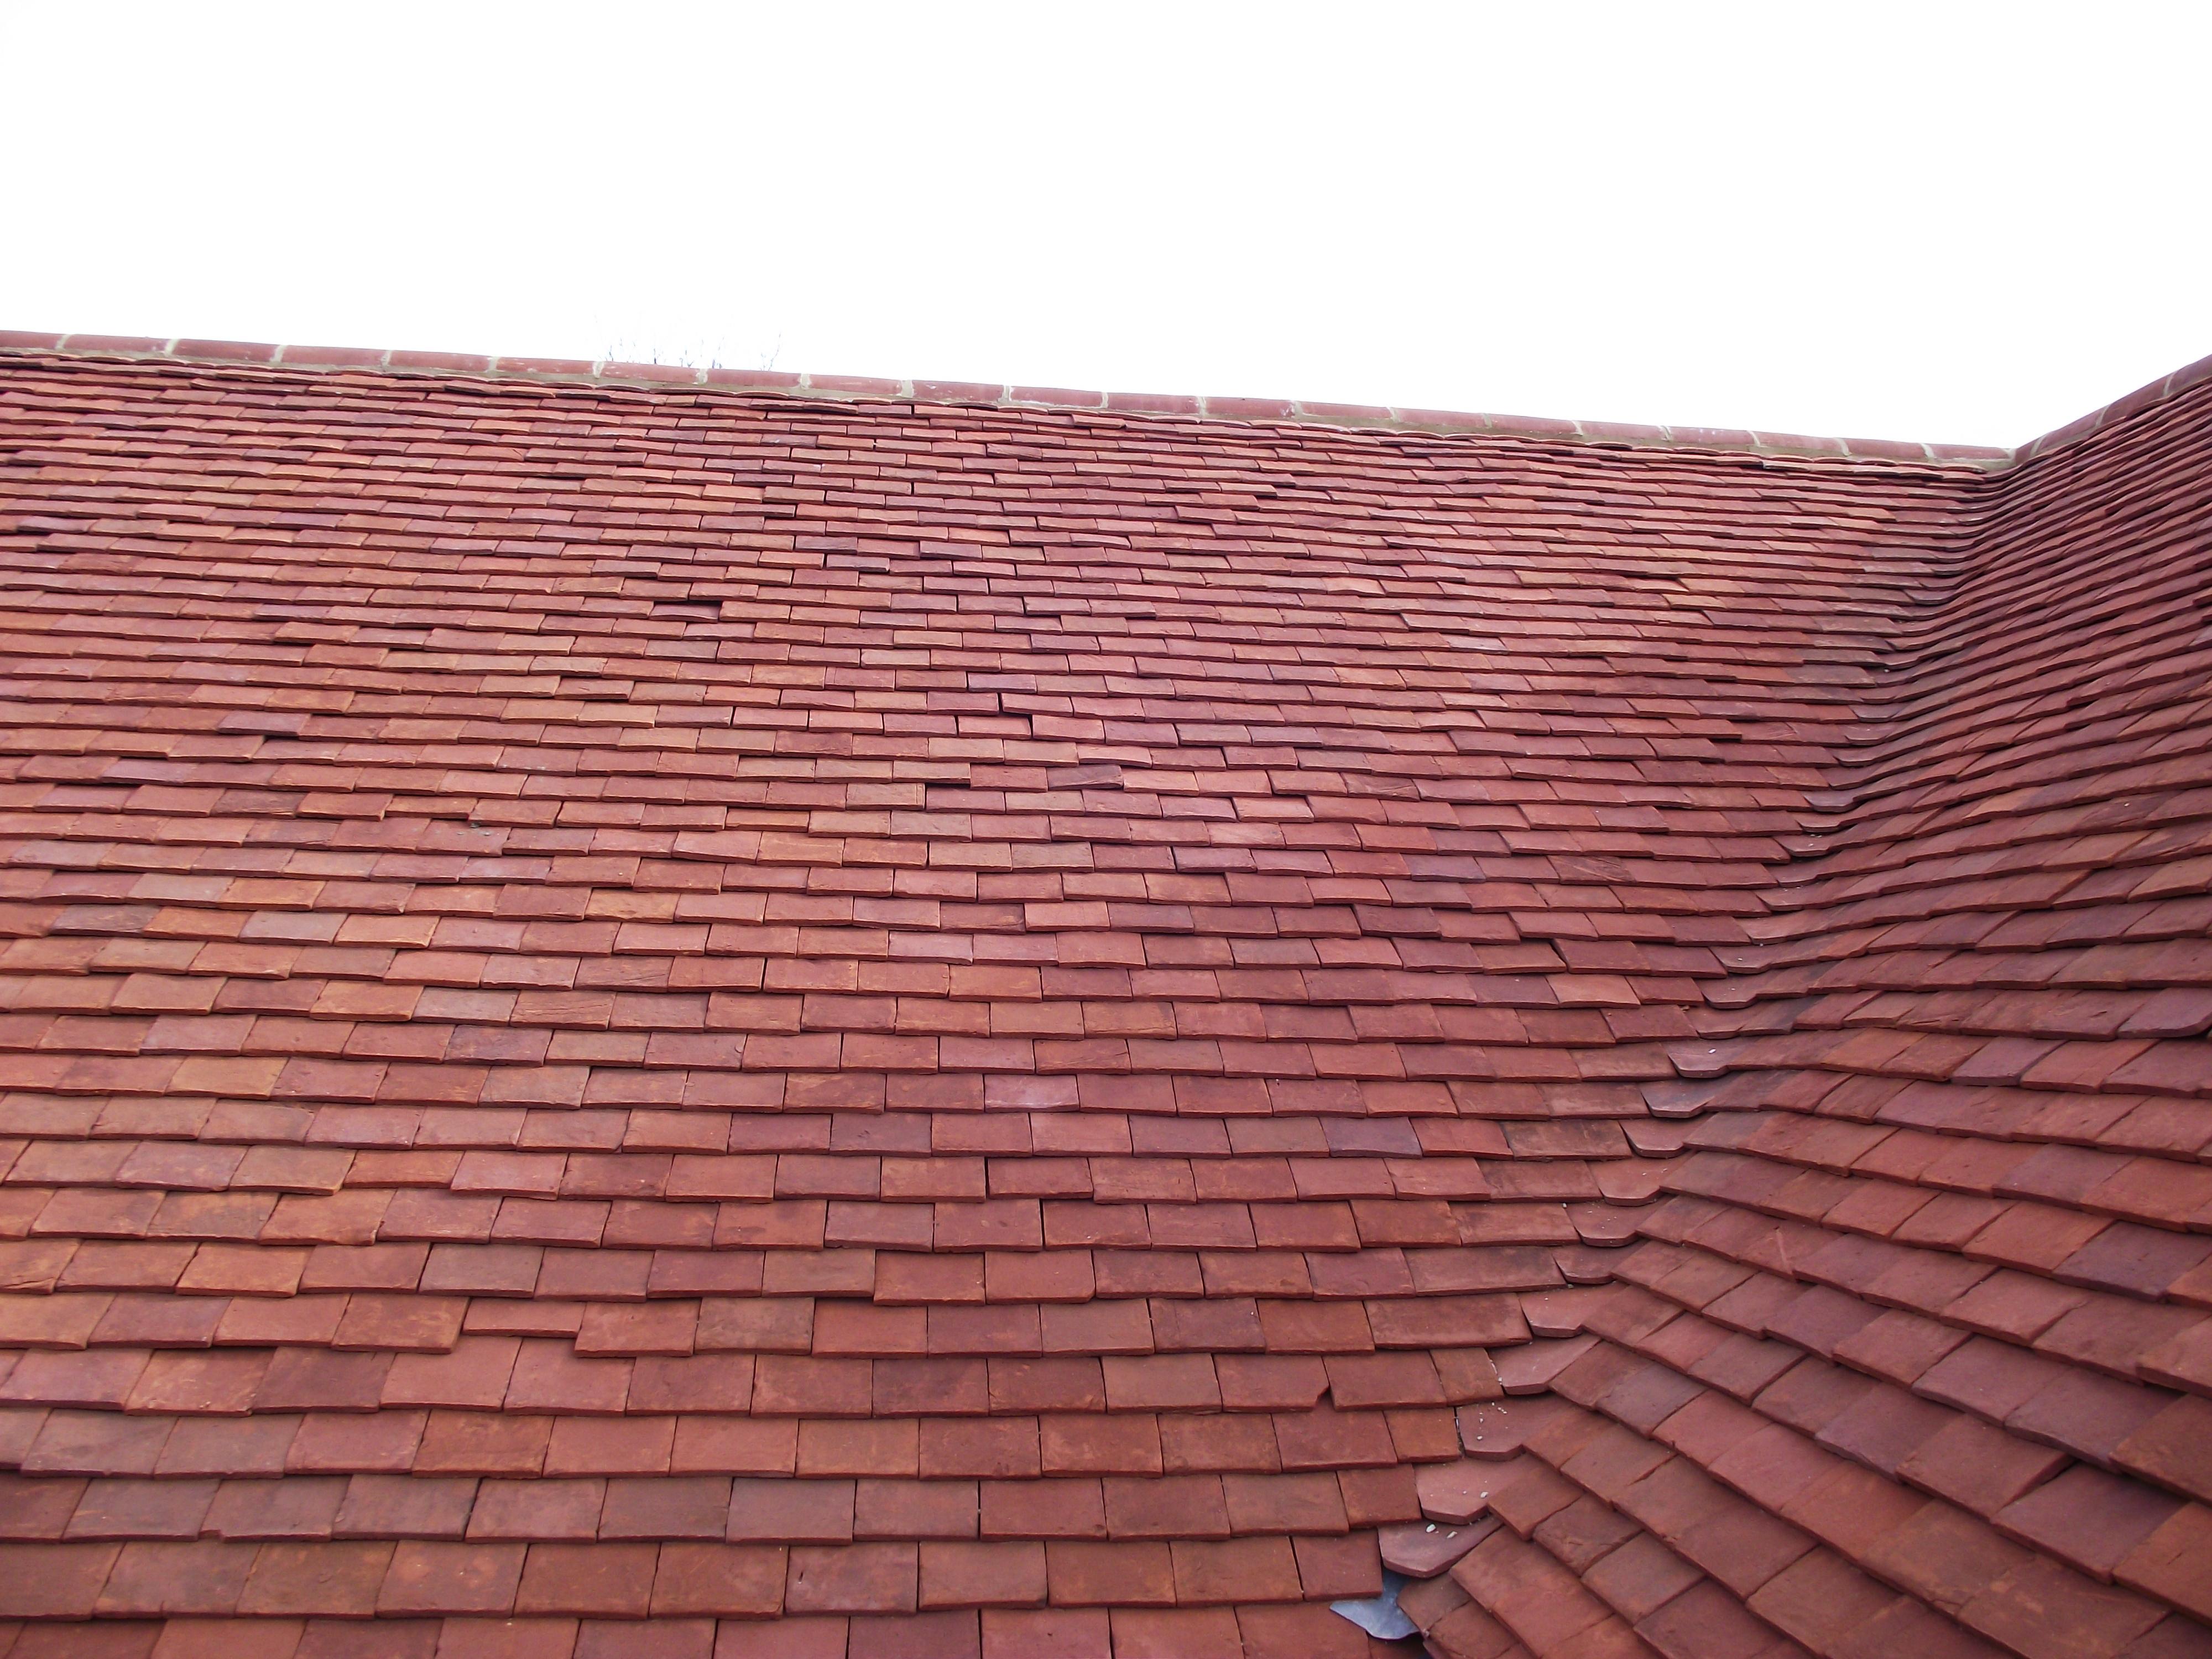 Alderbury Hand Made Clay Roof Tiles